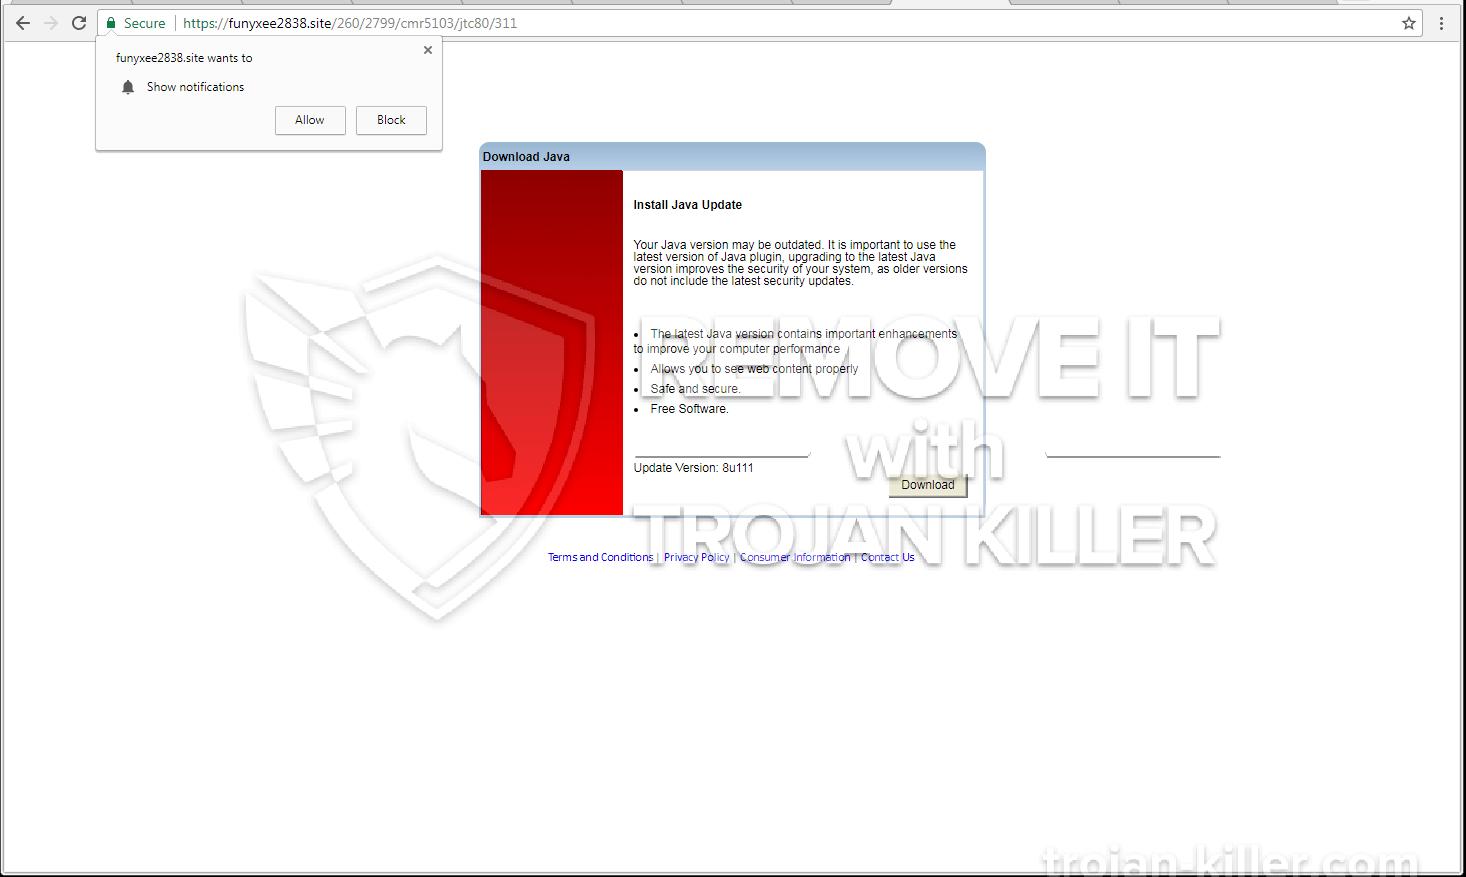 Funyxee2838.site virus